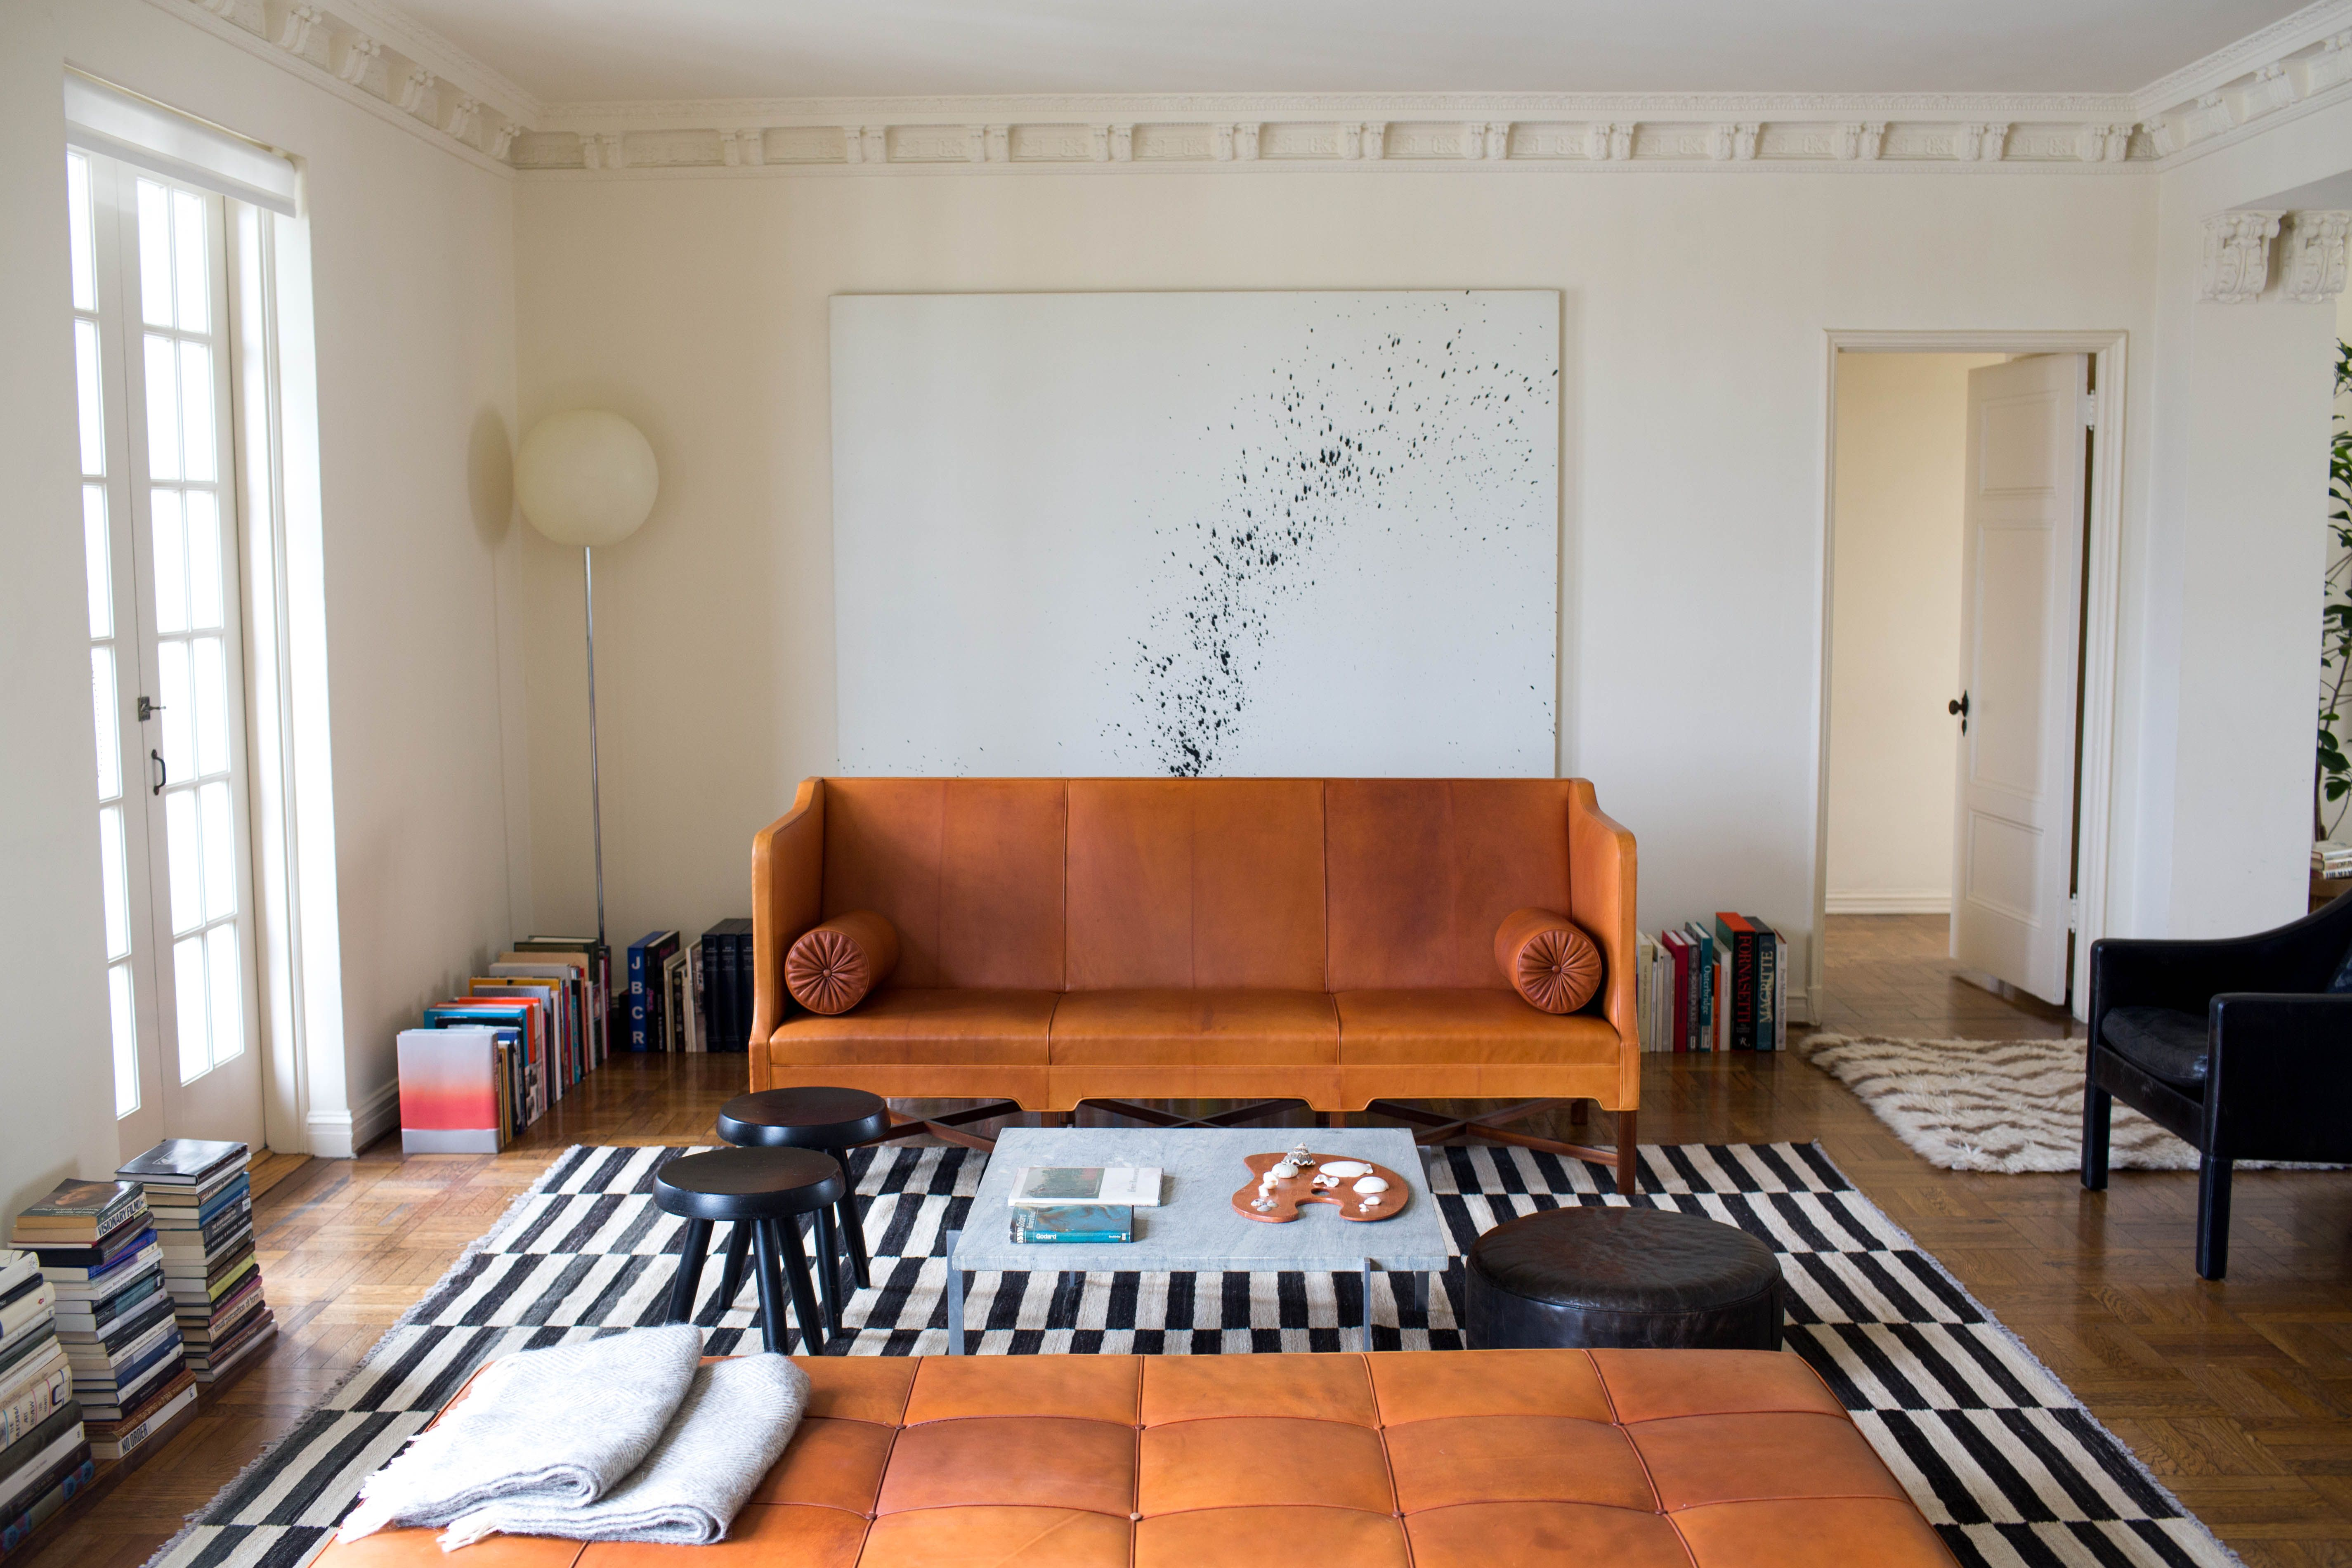 Lisa Overduin LA House for Rip Tan, black and white rug, leather vintage sofa, artwork